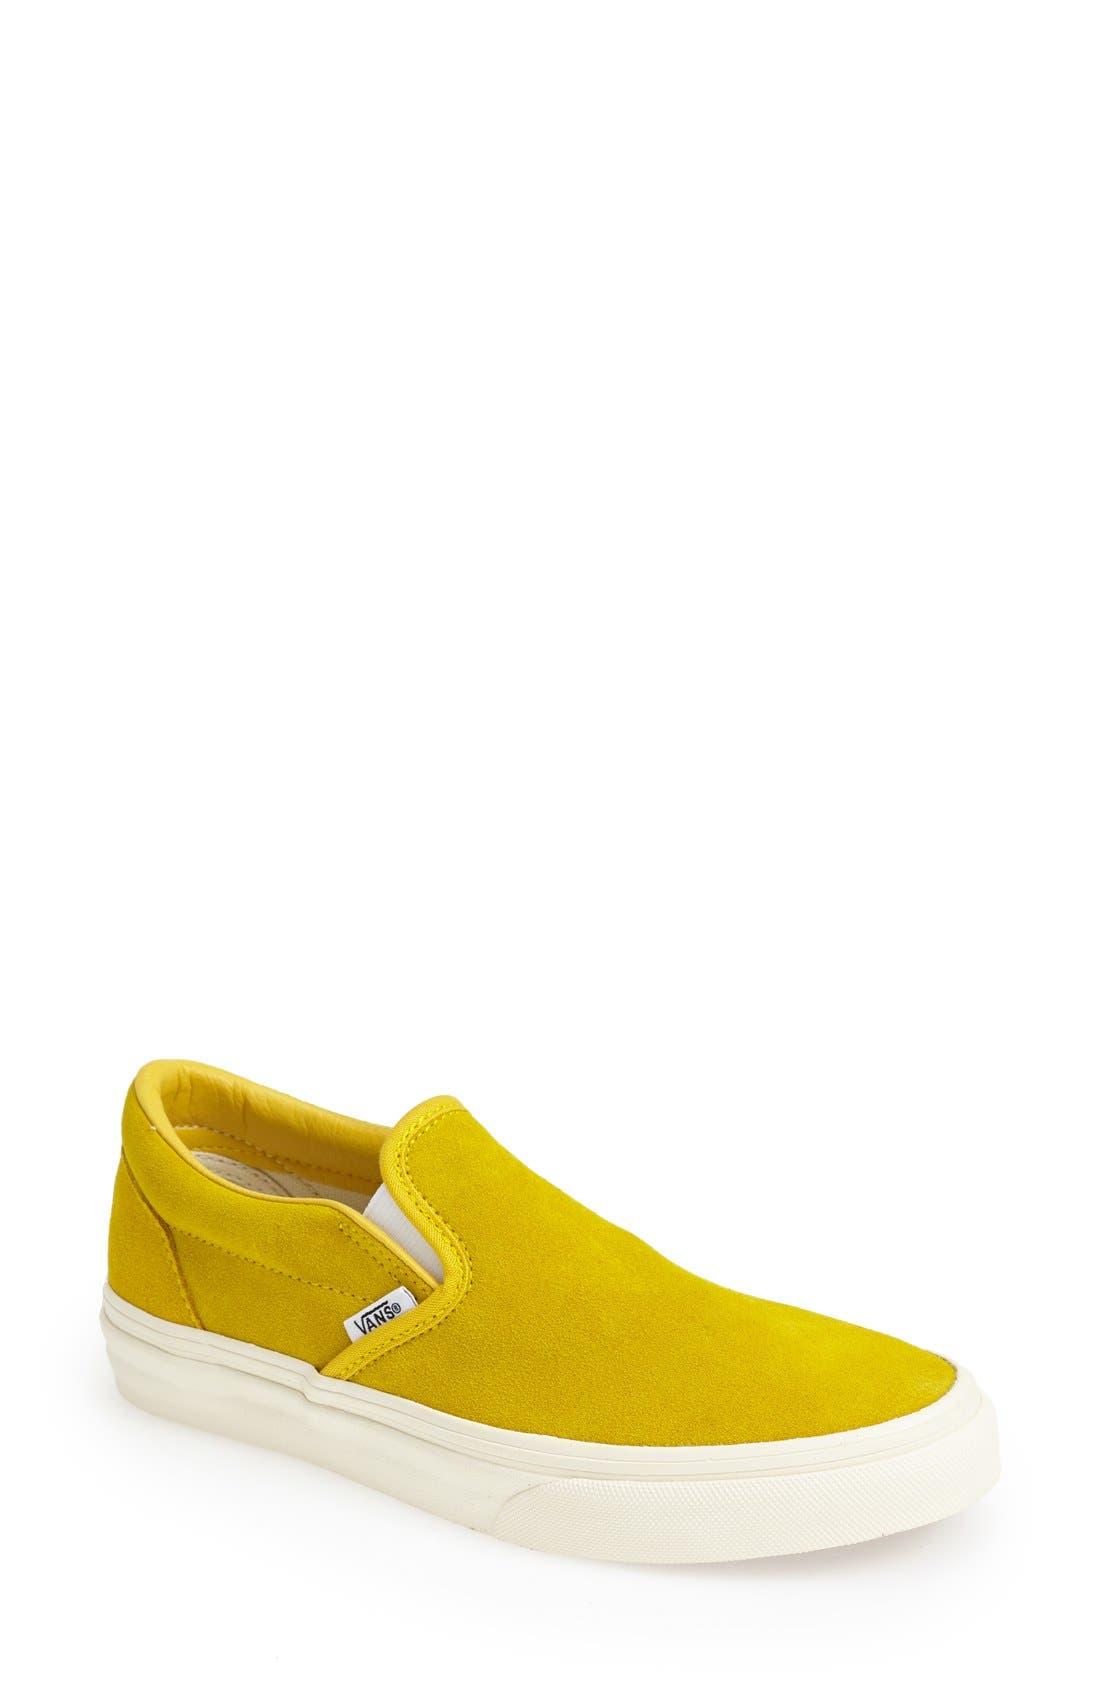 Main Image - Vans Suede Slip-On Sneaker (Women)